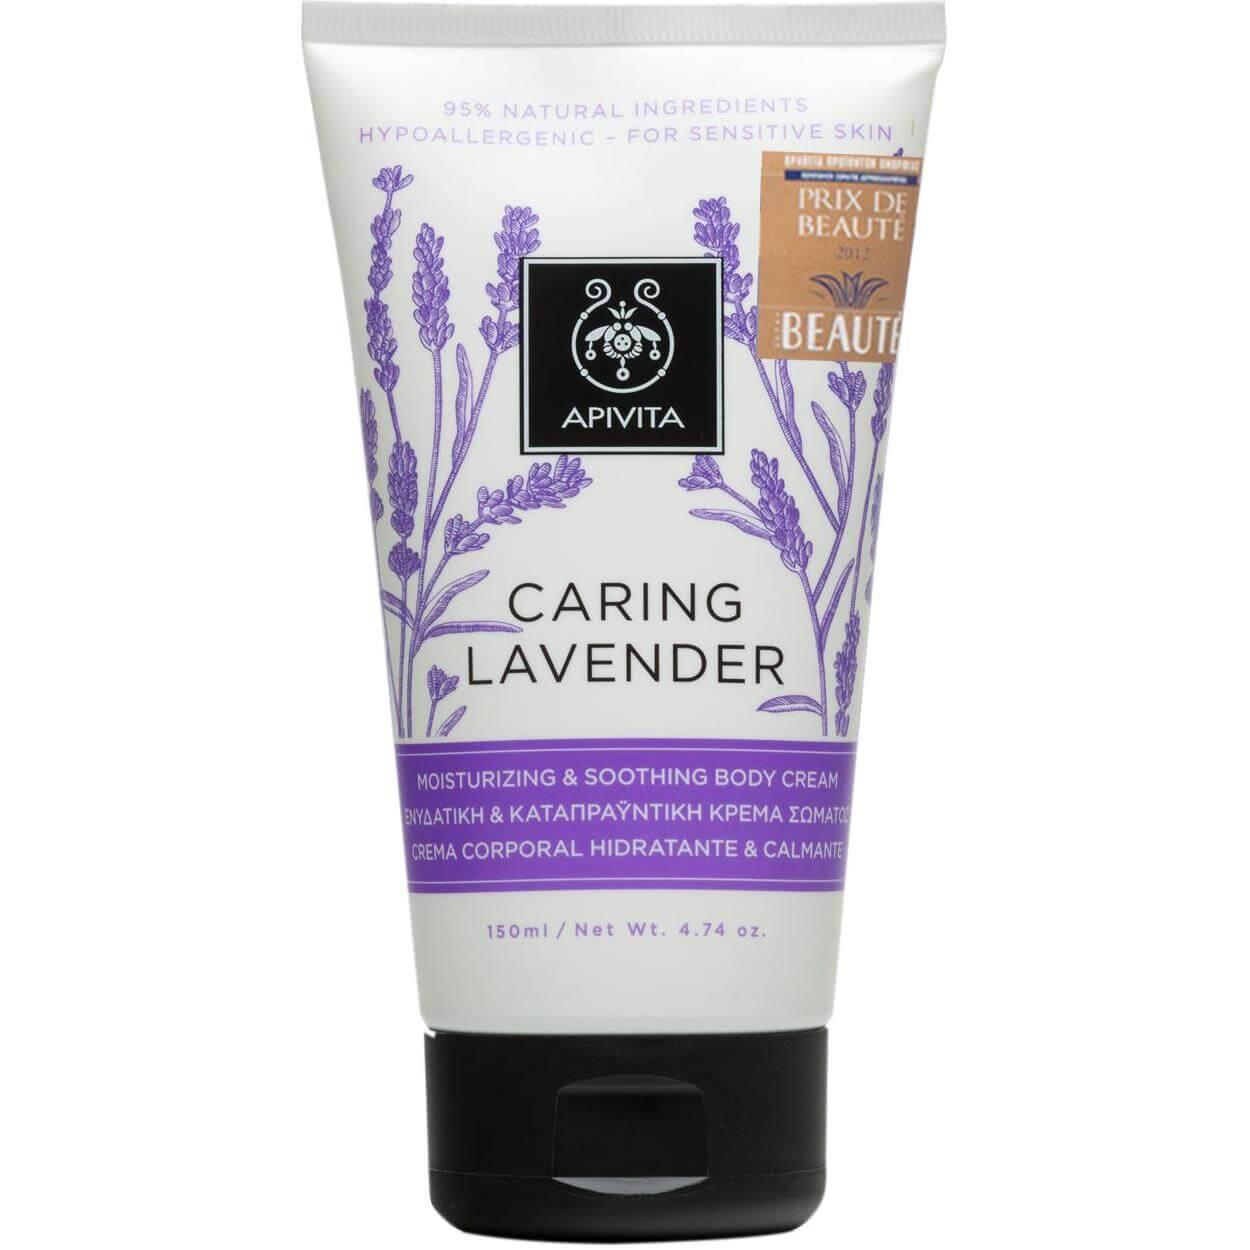 Apivita Caring Lavender Moisturizing Body Cream Ενυδατική & Καταπραϋντική Κρέμα Σώματος με Βιολογικό Αιθέριο Έλαιο Λεβάντας150ml